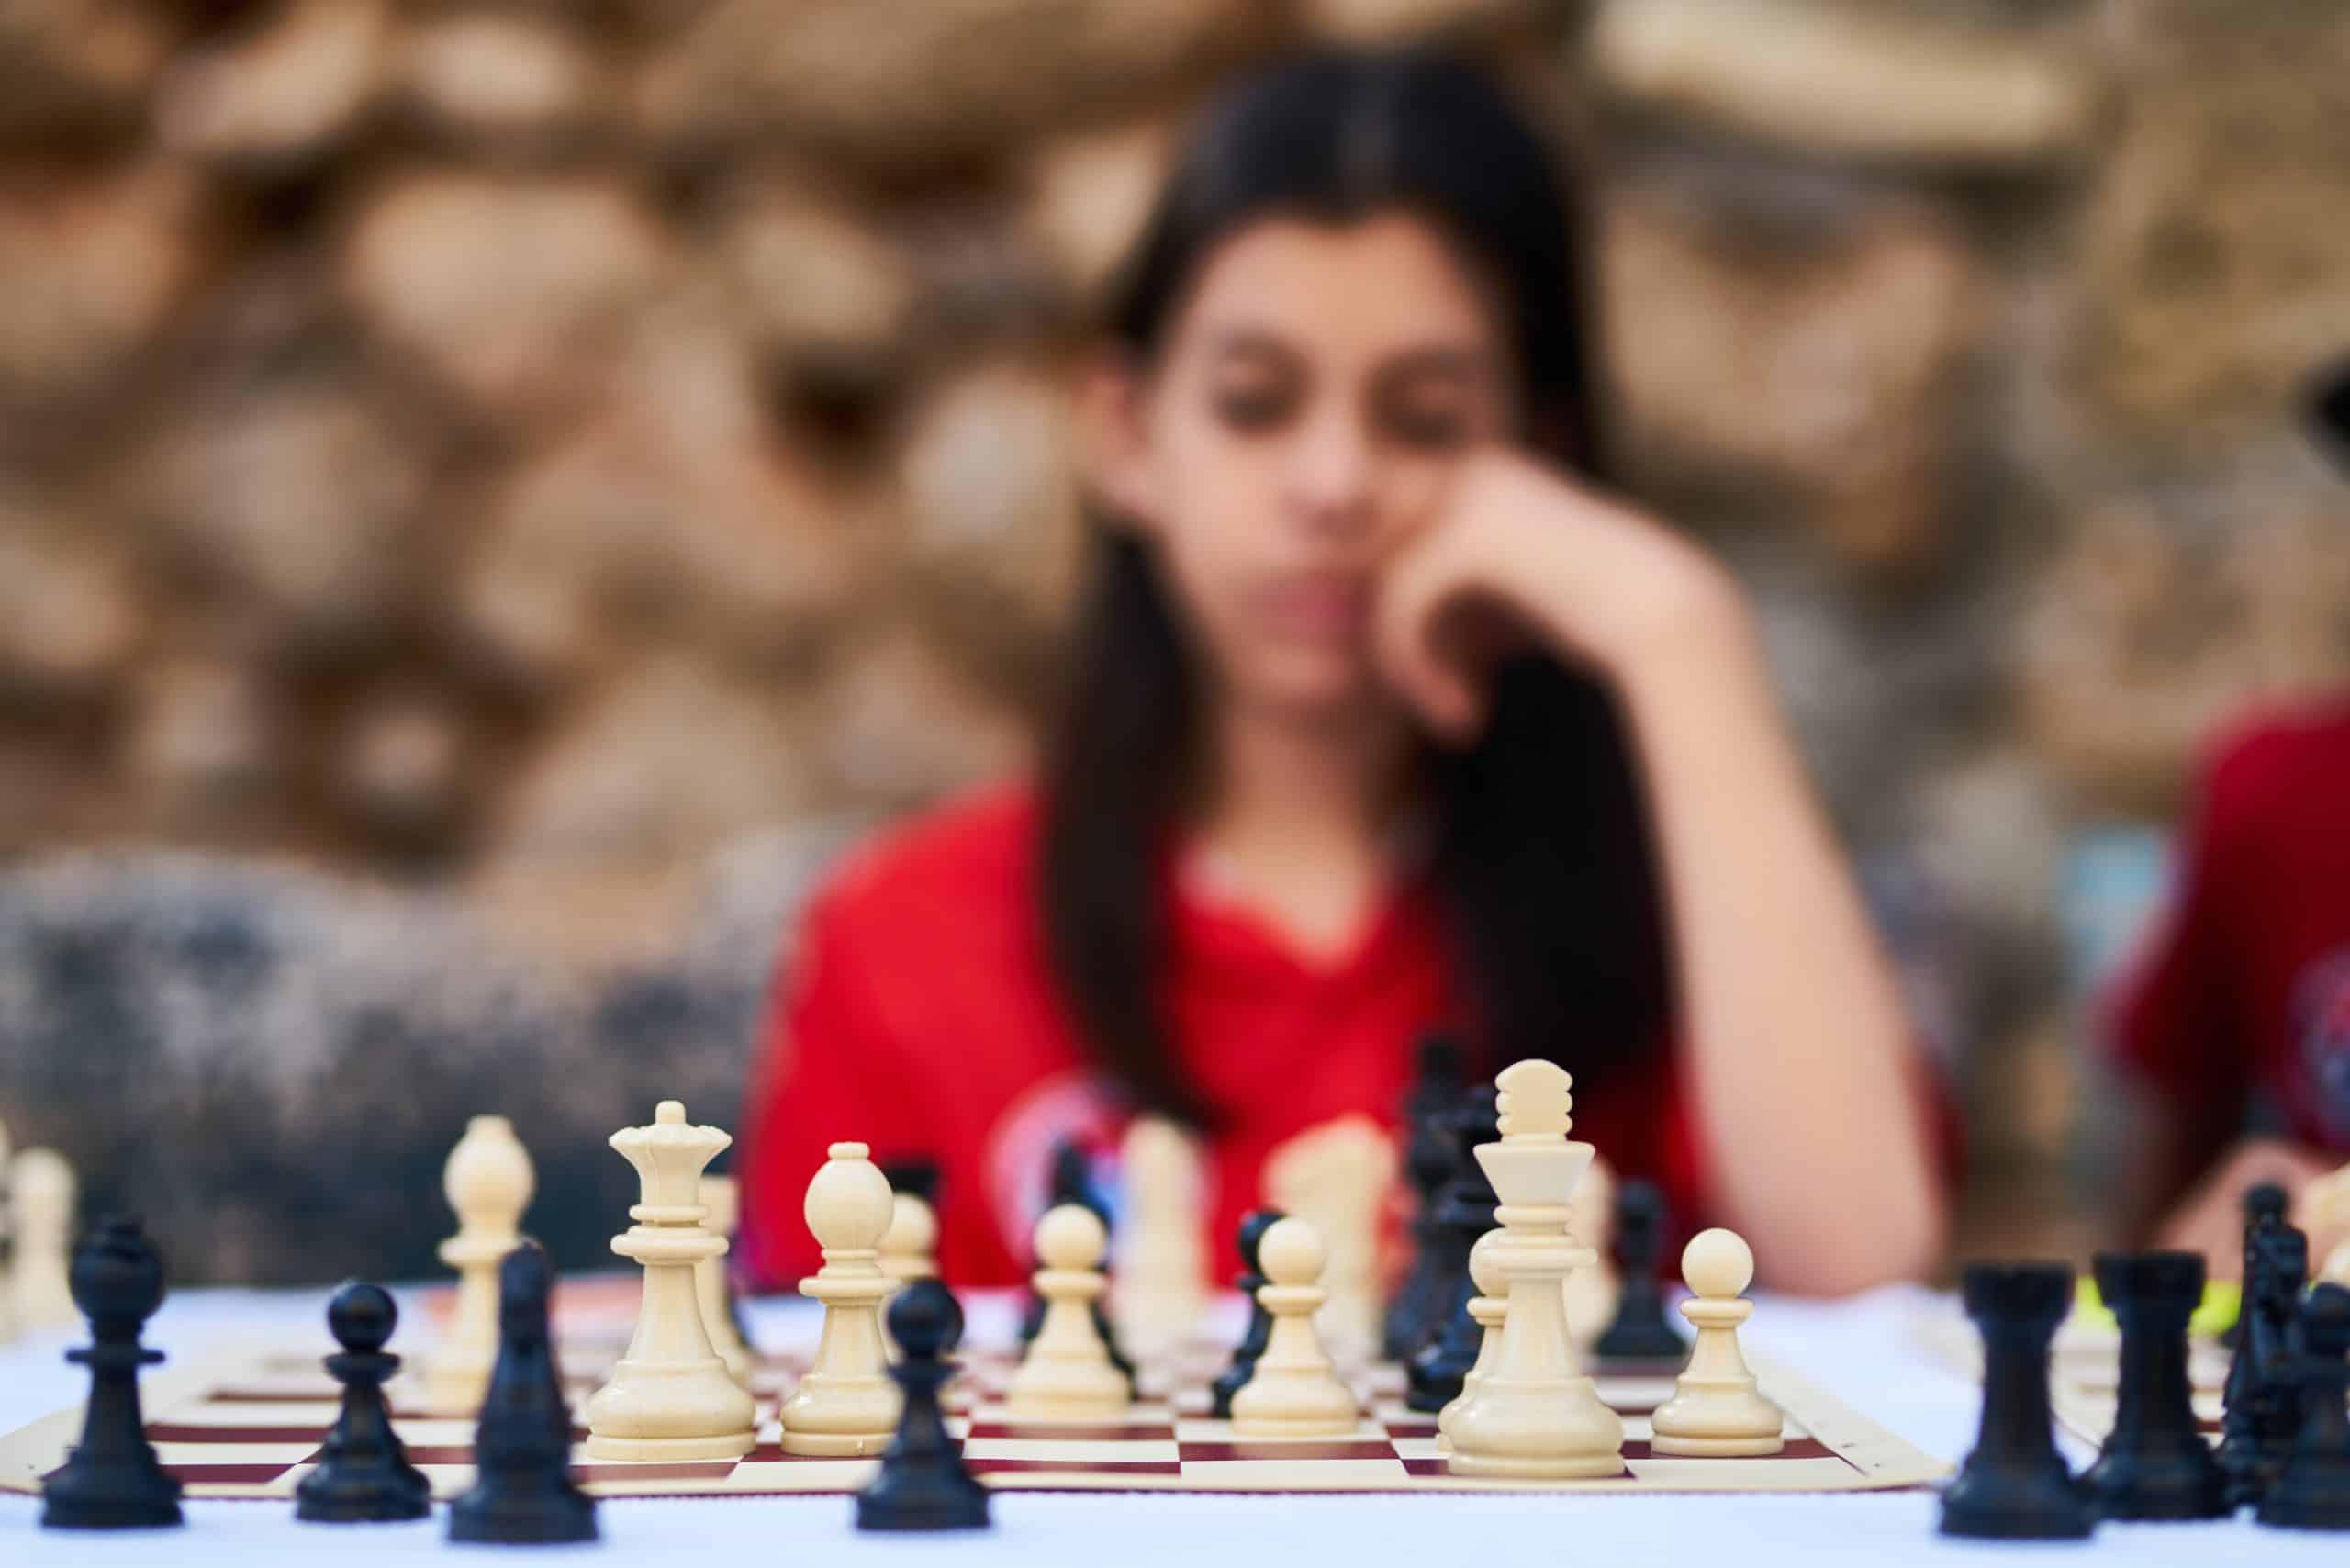 strategic plan chess game